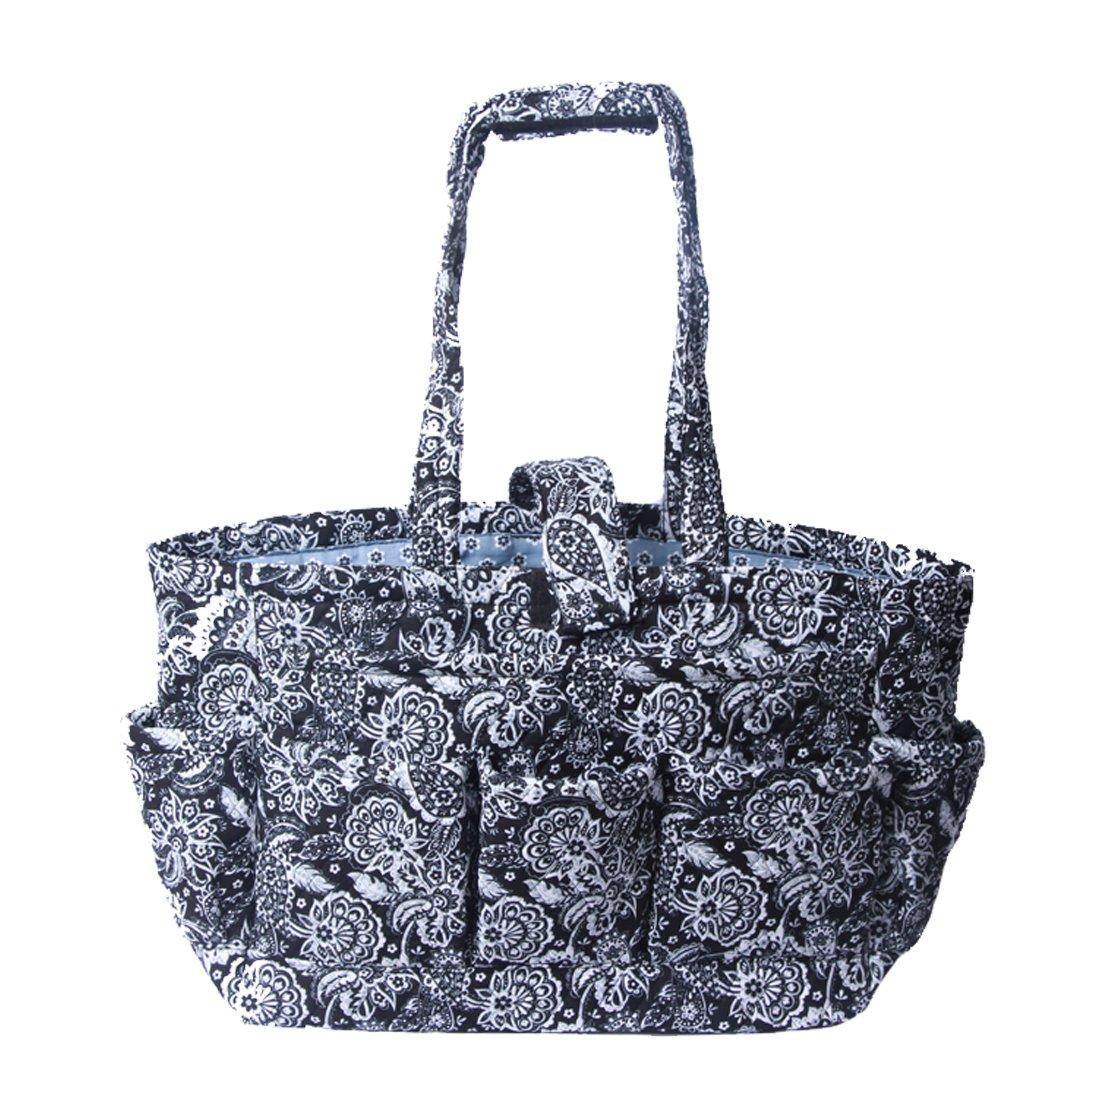 Floral Quilted Cotton Needle Bag Knitting Bag Yarn Storage Tote (Bule Damaks) SAIDI APPAREL MANUFACTURER